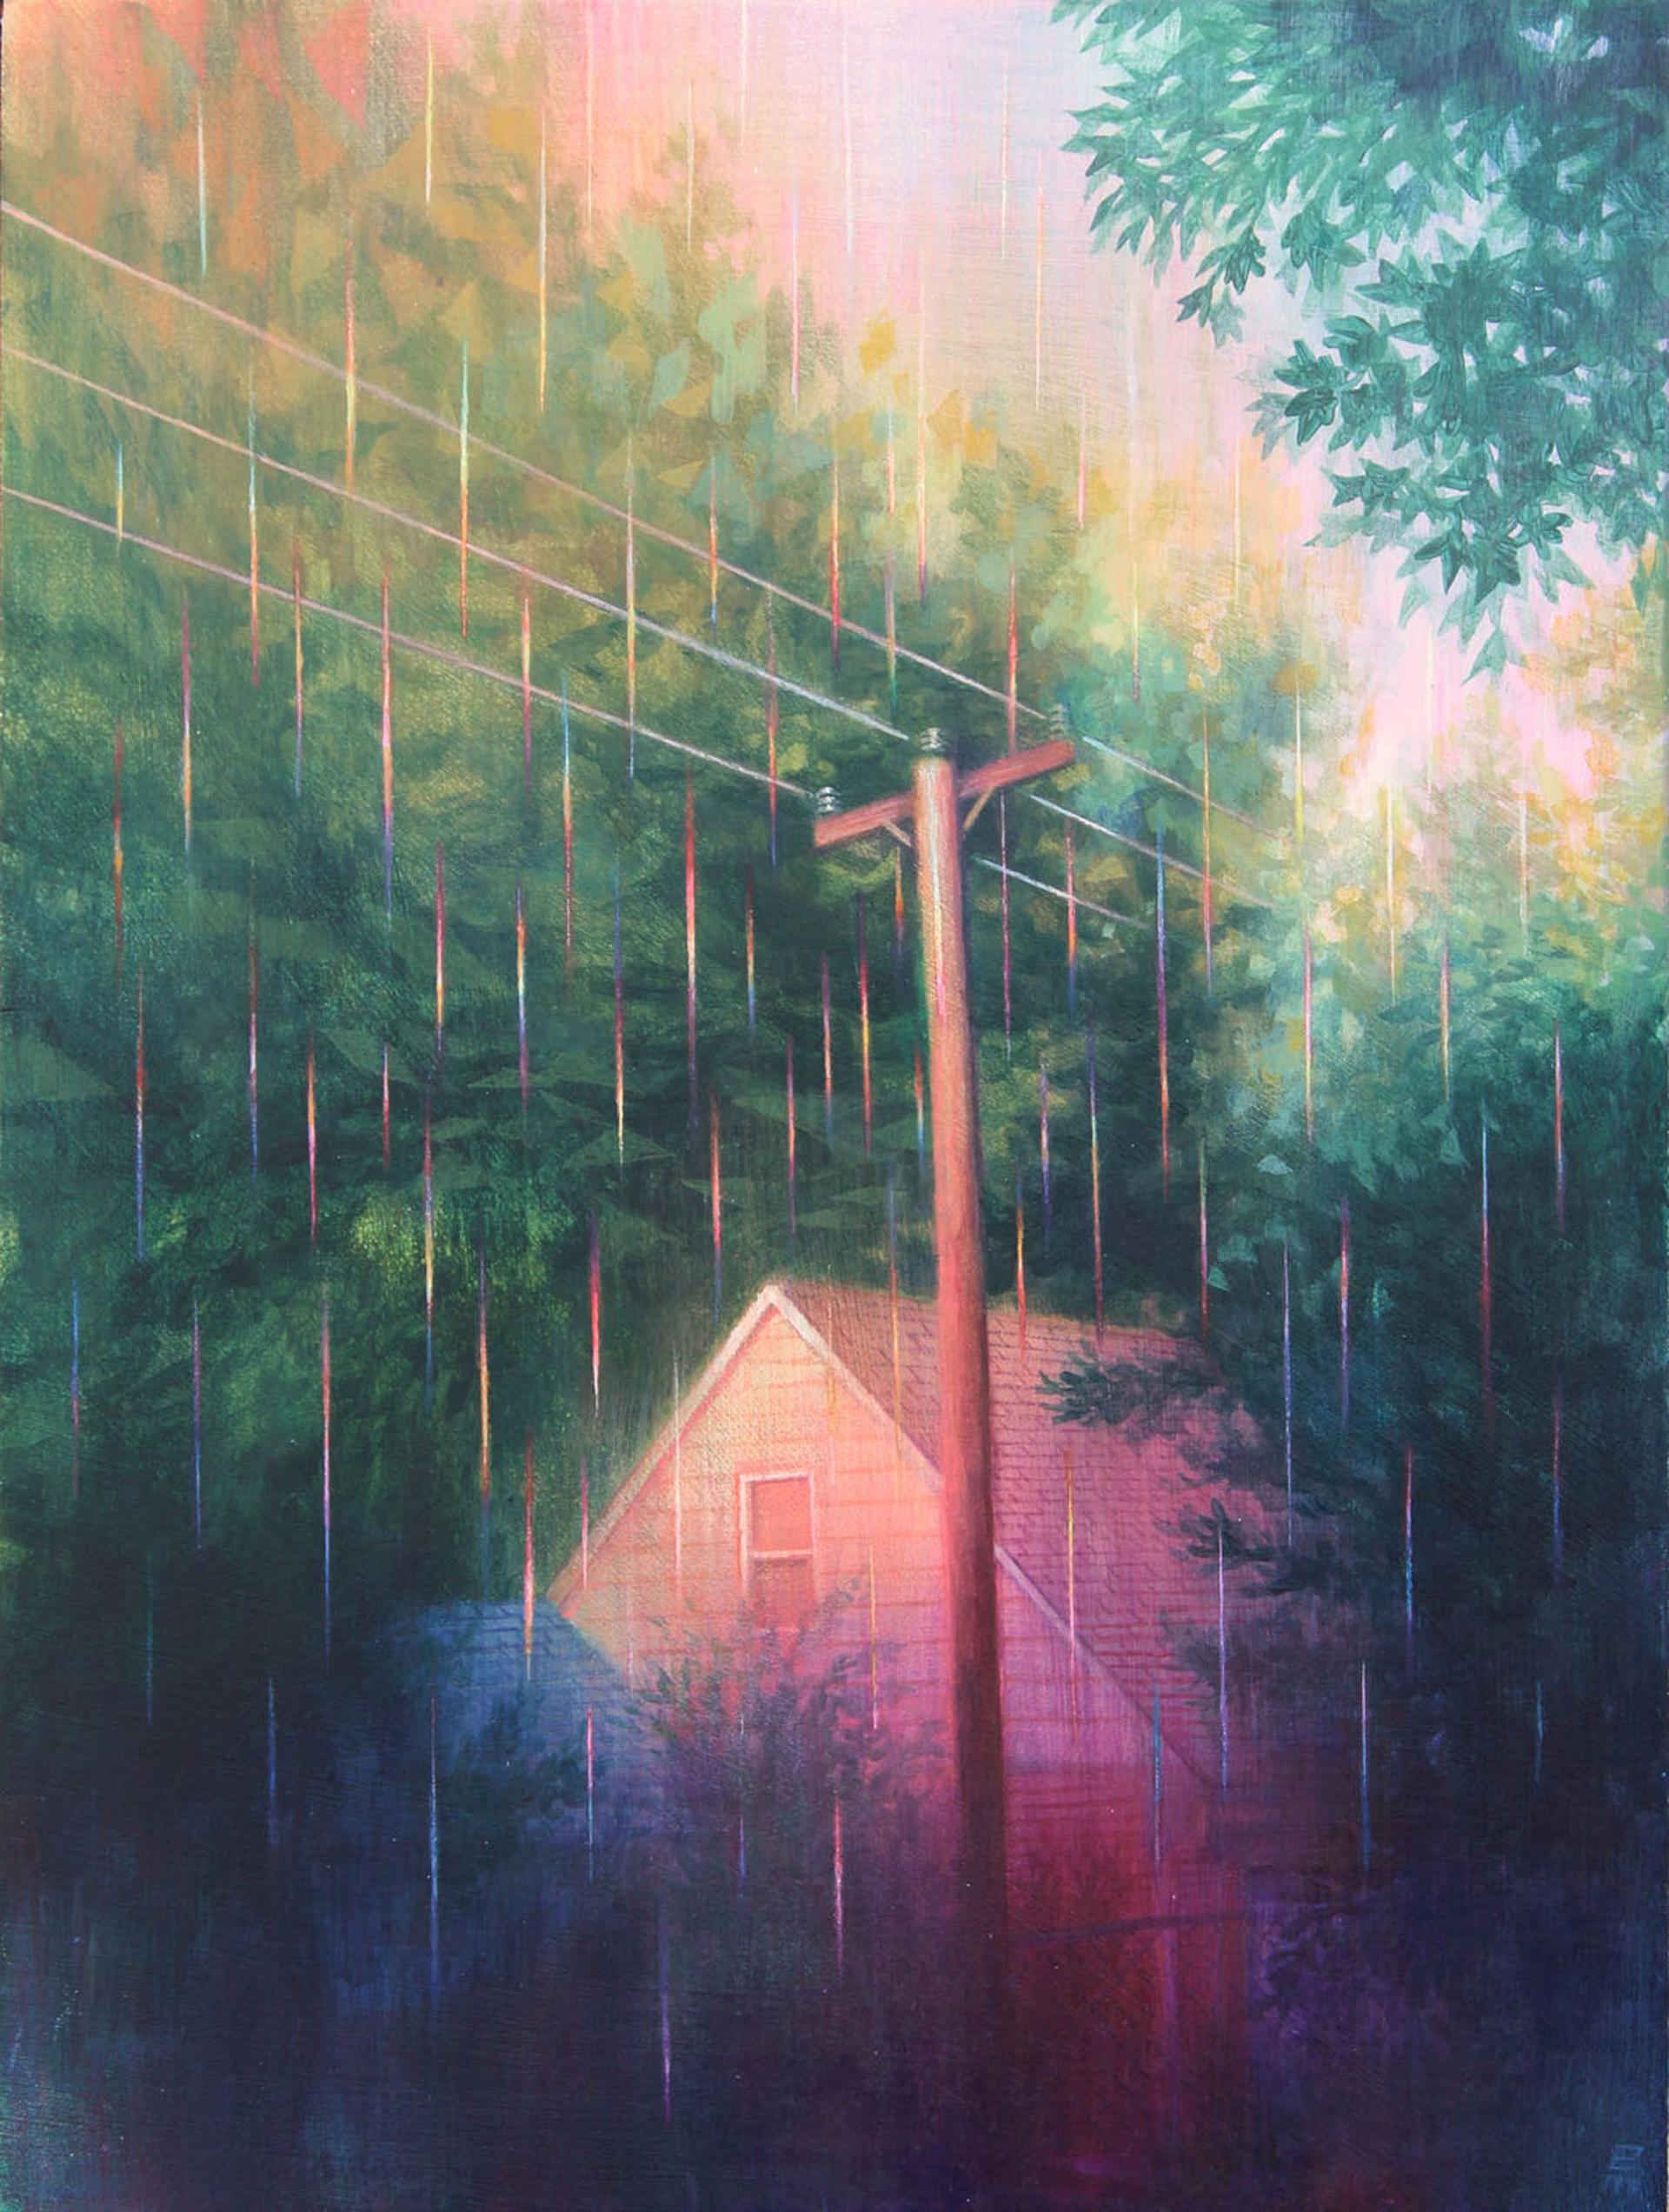 Quiet Light by Eli McMullen